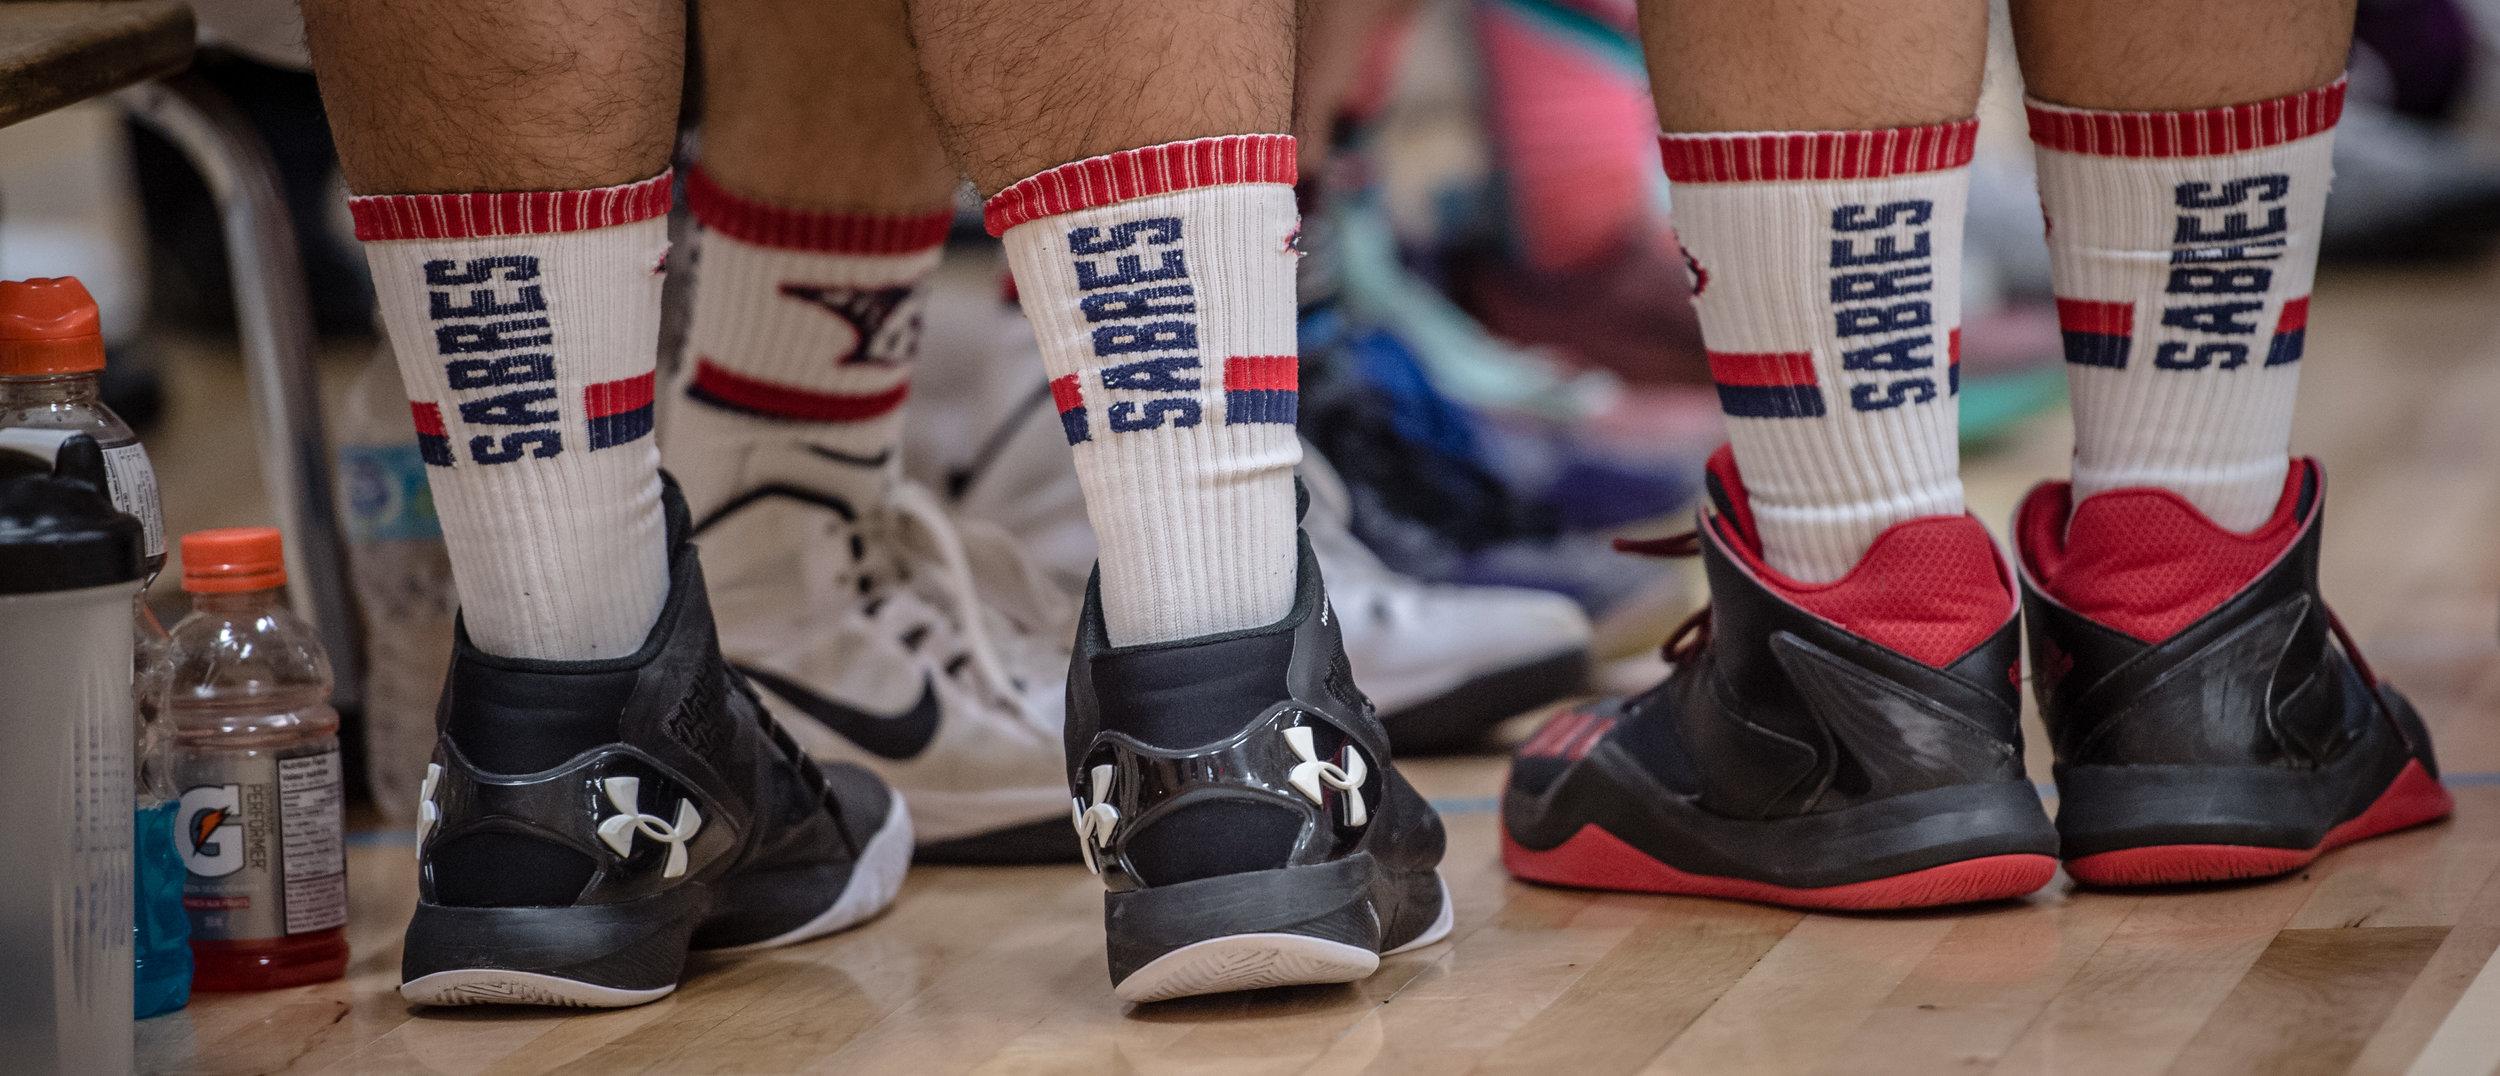 shoes 201.jpg